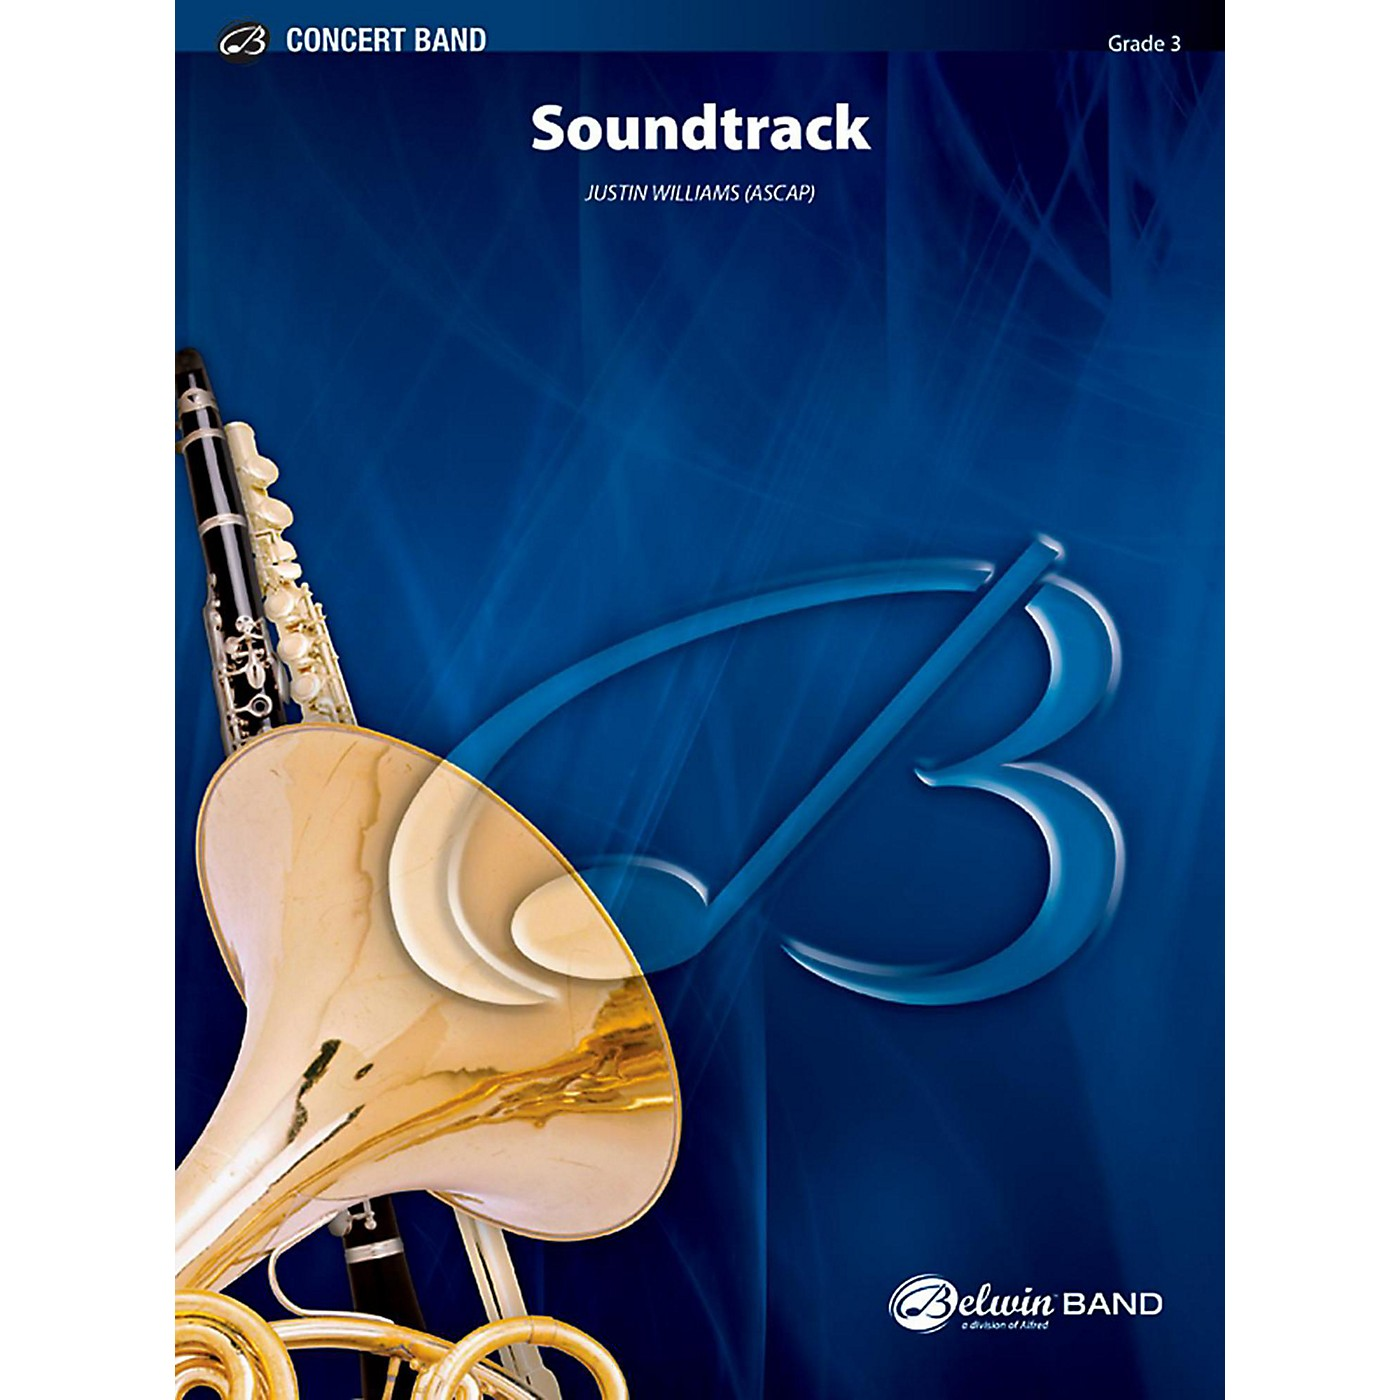 BELWIN Soundtrack Concert Band Grade 3 (Medium Easy) thumbnail